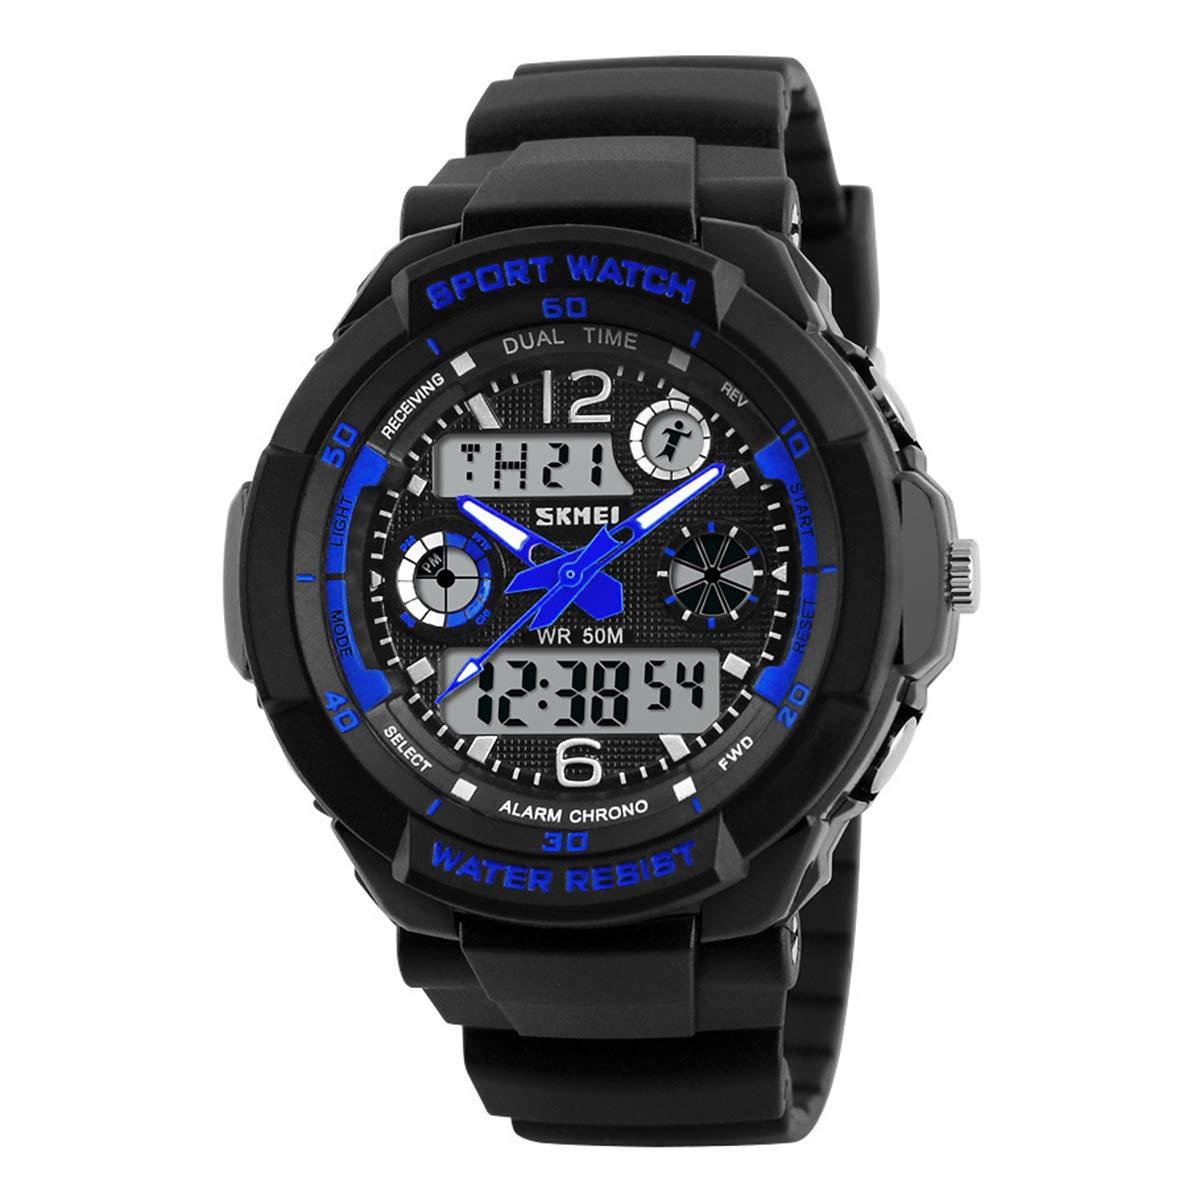 Kids Watch Sport Waterproof Multi Function Analog Quartz LED Alarm Stopwatch Digital Child Electronic Wristwatch for Boy Girl Silver Blue by AFARER